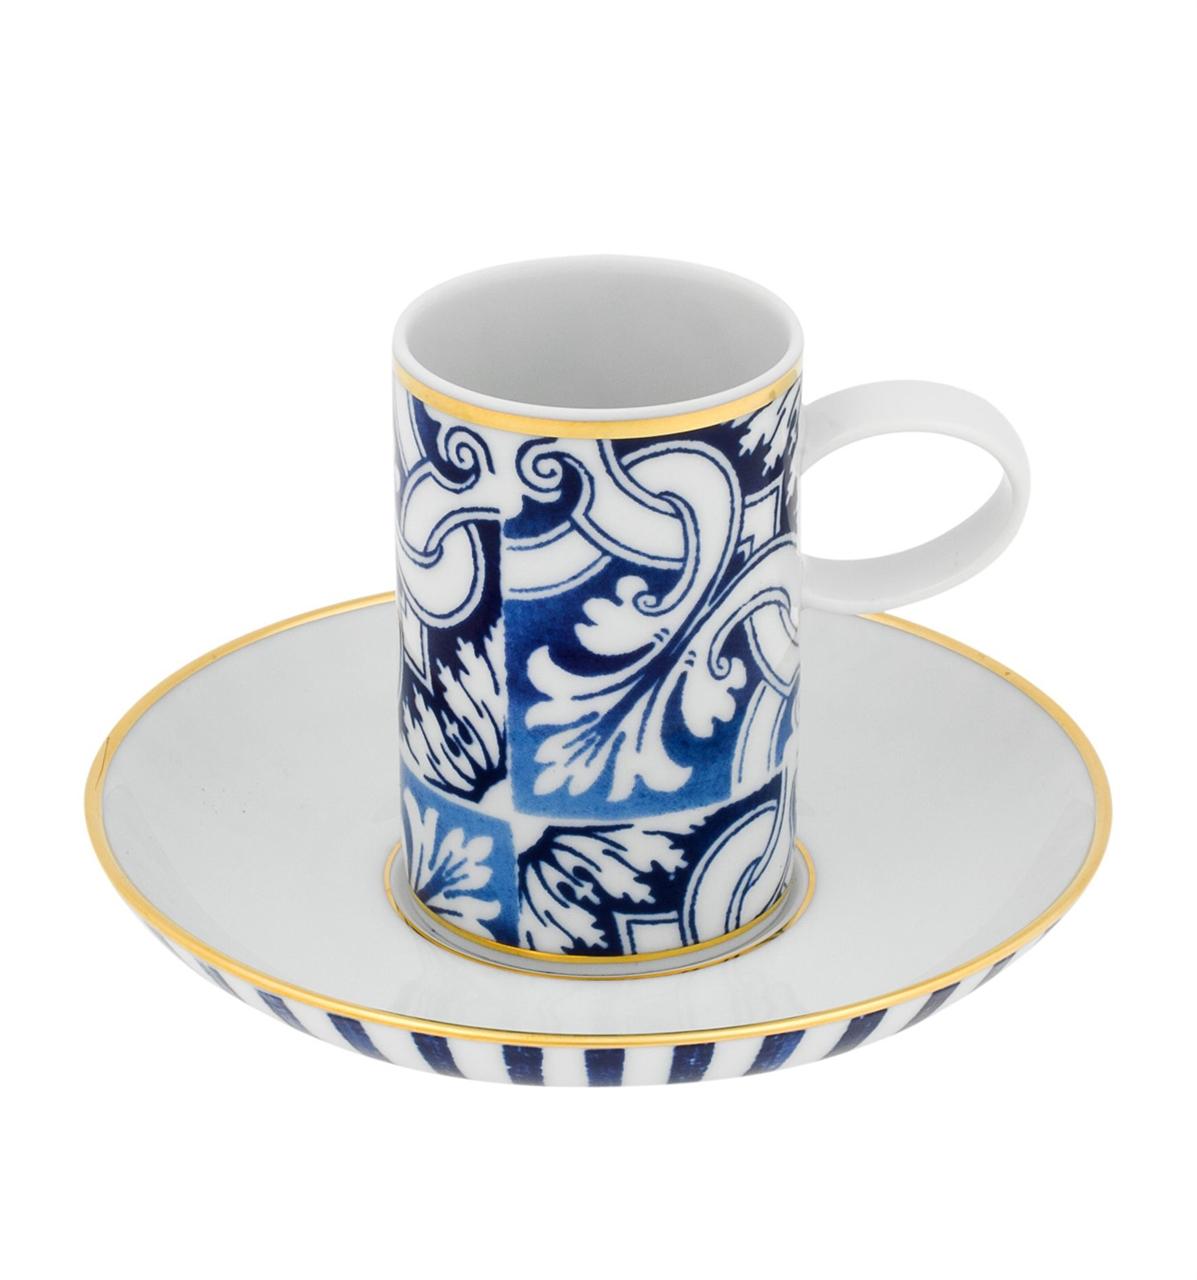 Chávena Café c/ Pires Transatlântica